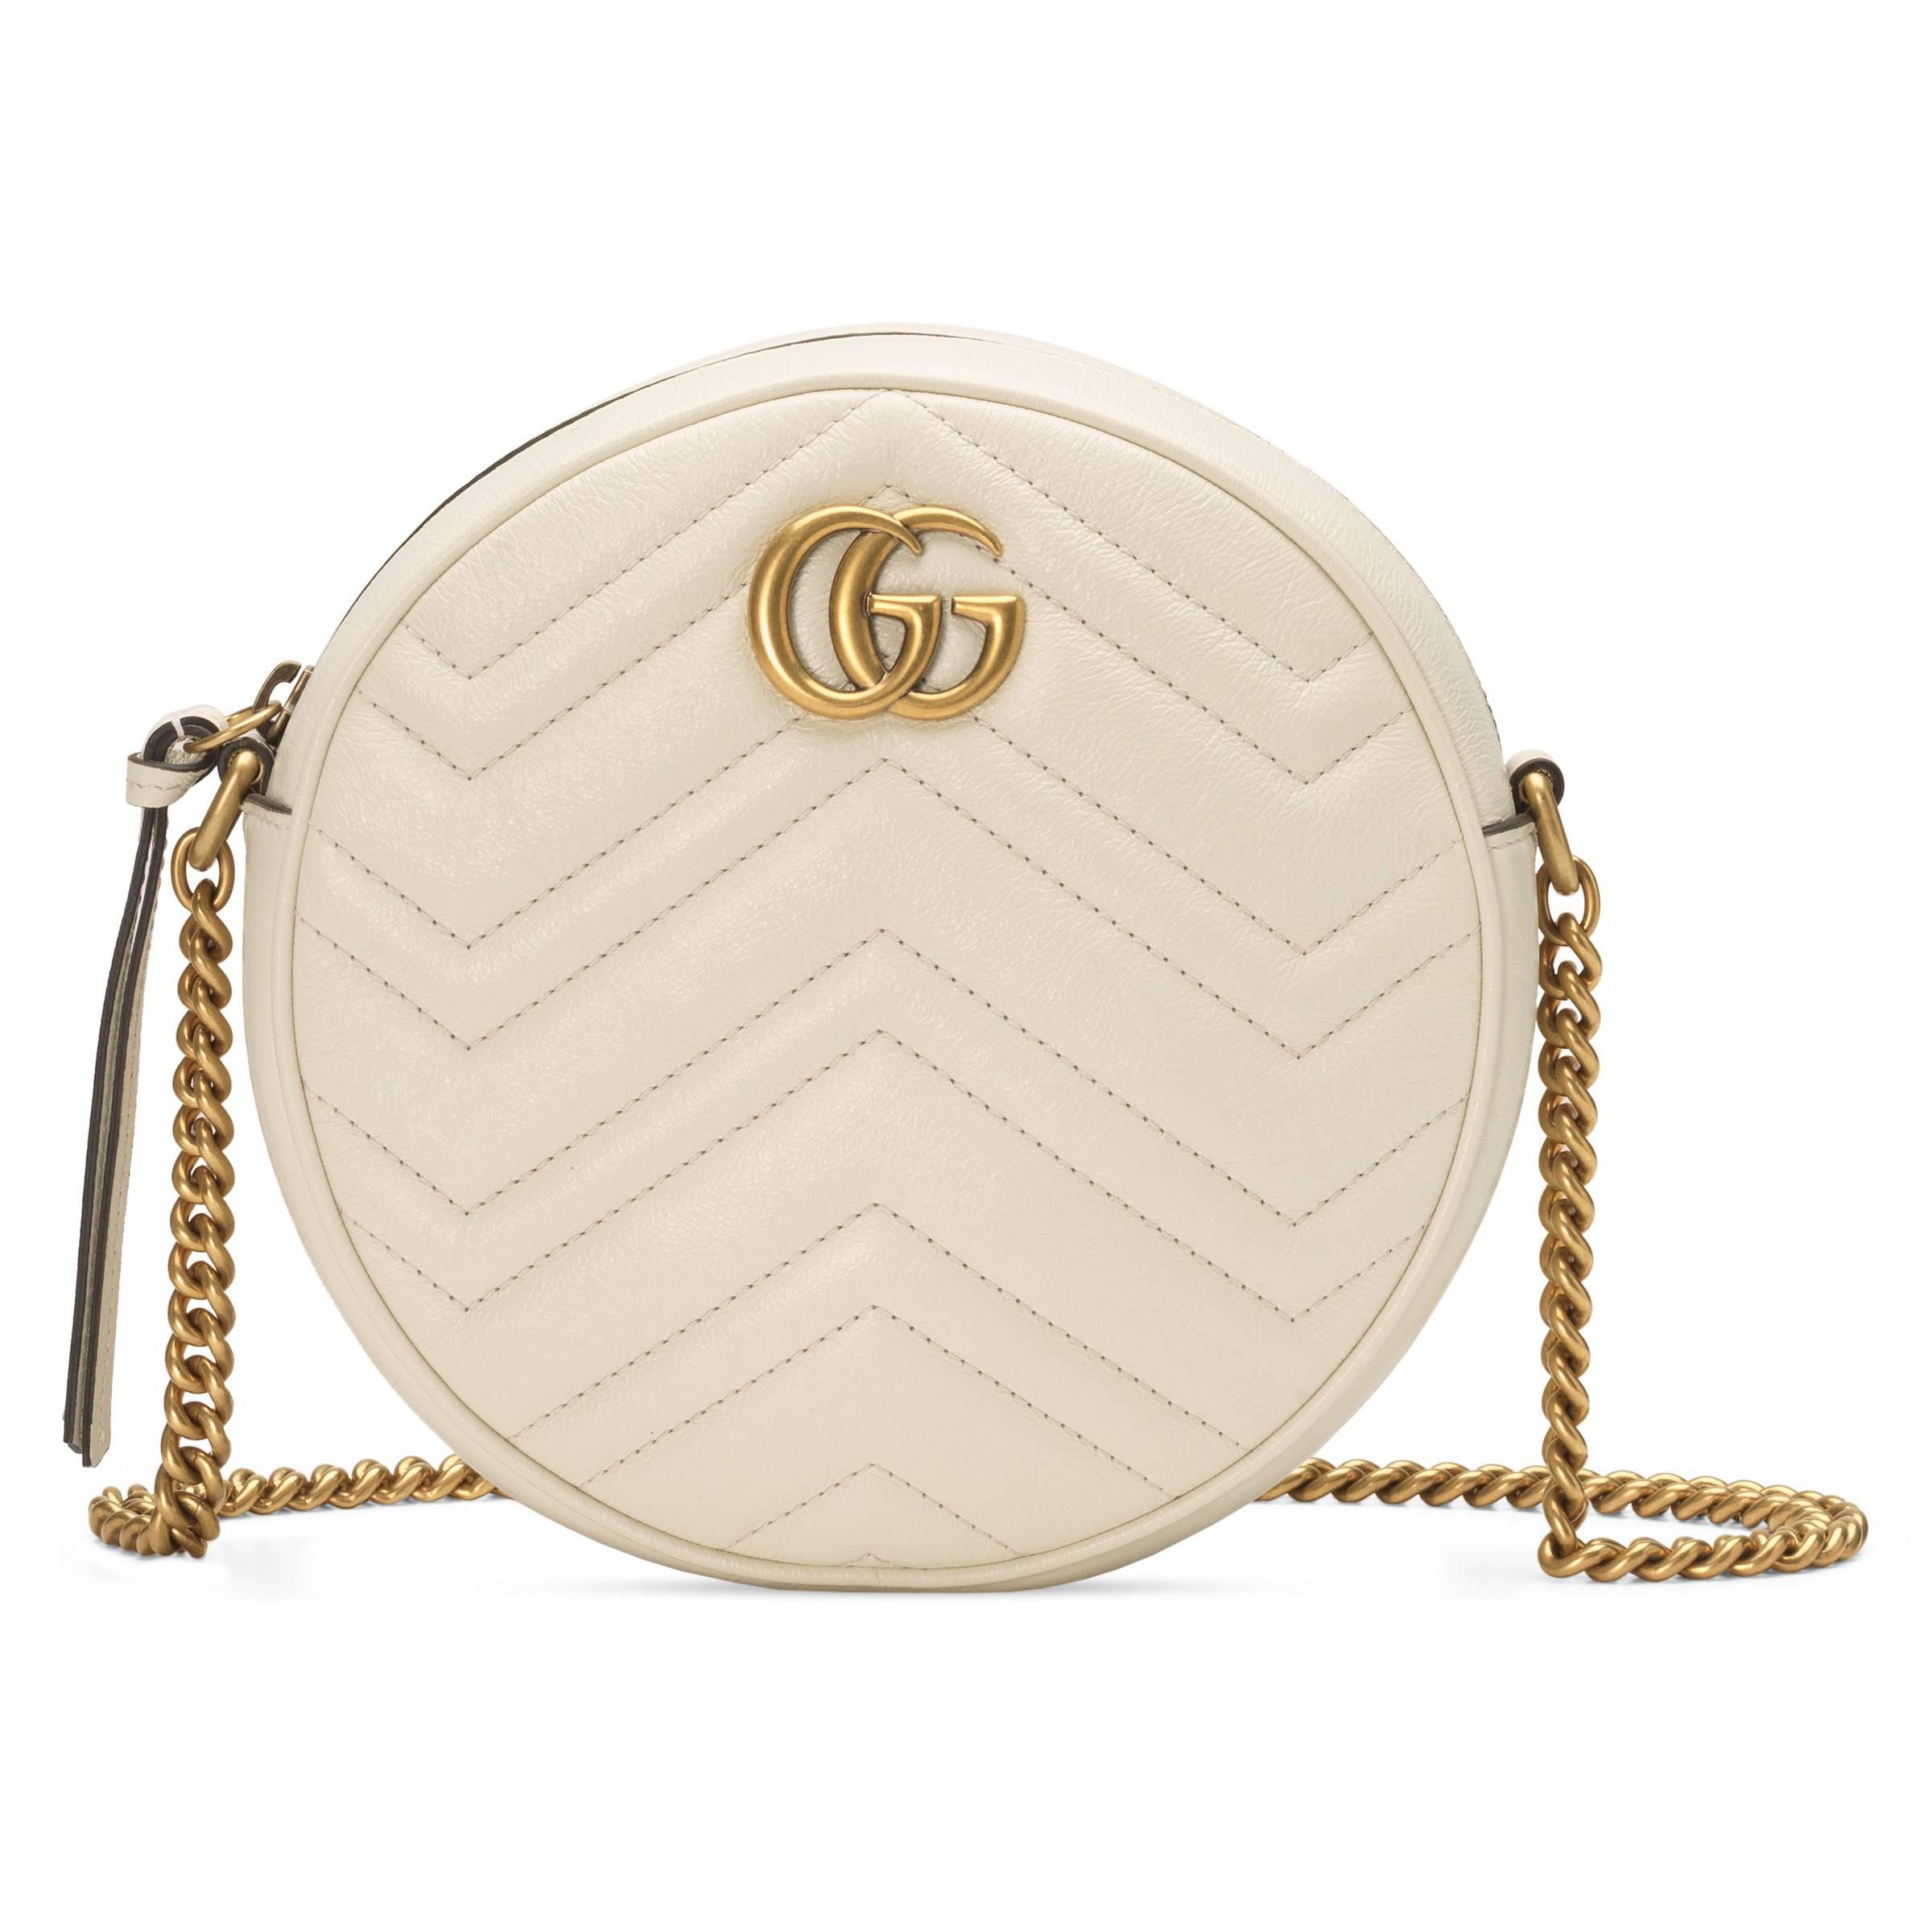 5407de8641d2 Gucci GG Marmont Mini Round Shoulder Bag in White - Lyst